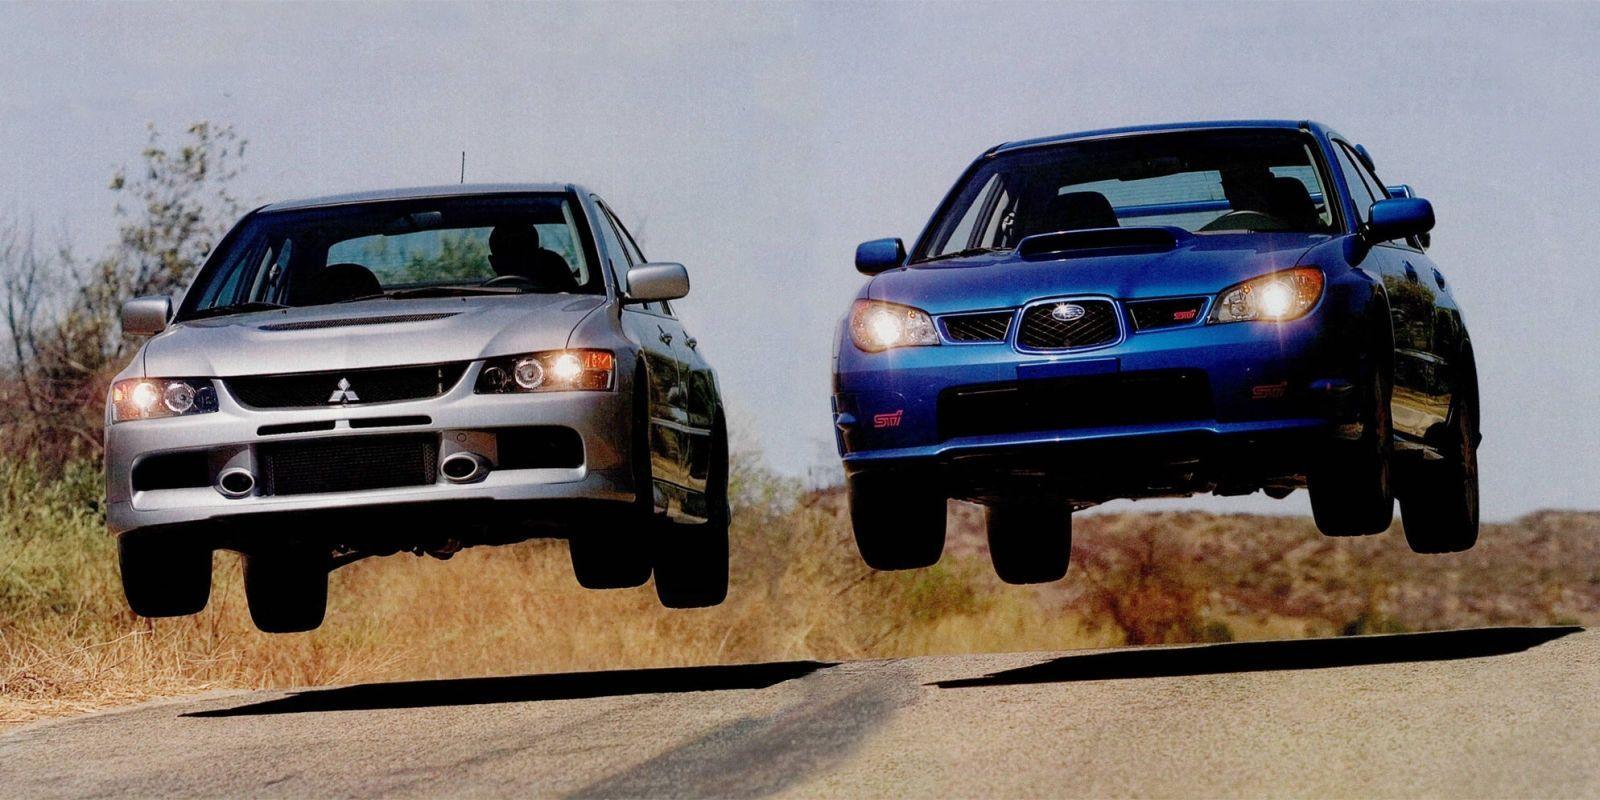 Subaru Wrx Vs Sti >> Mitsubishi Evo Ix Mr Vs Subaru Impreza Wrx Sti Which Is Better